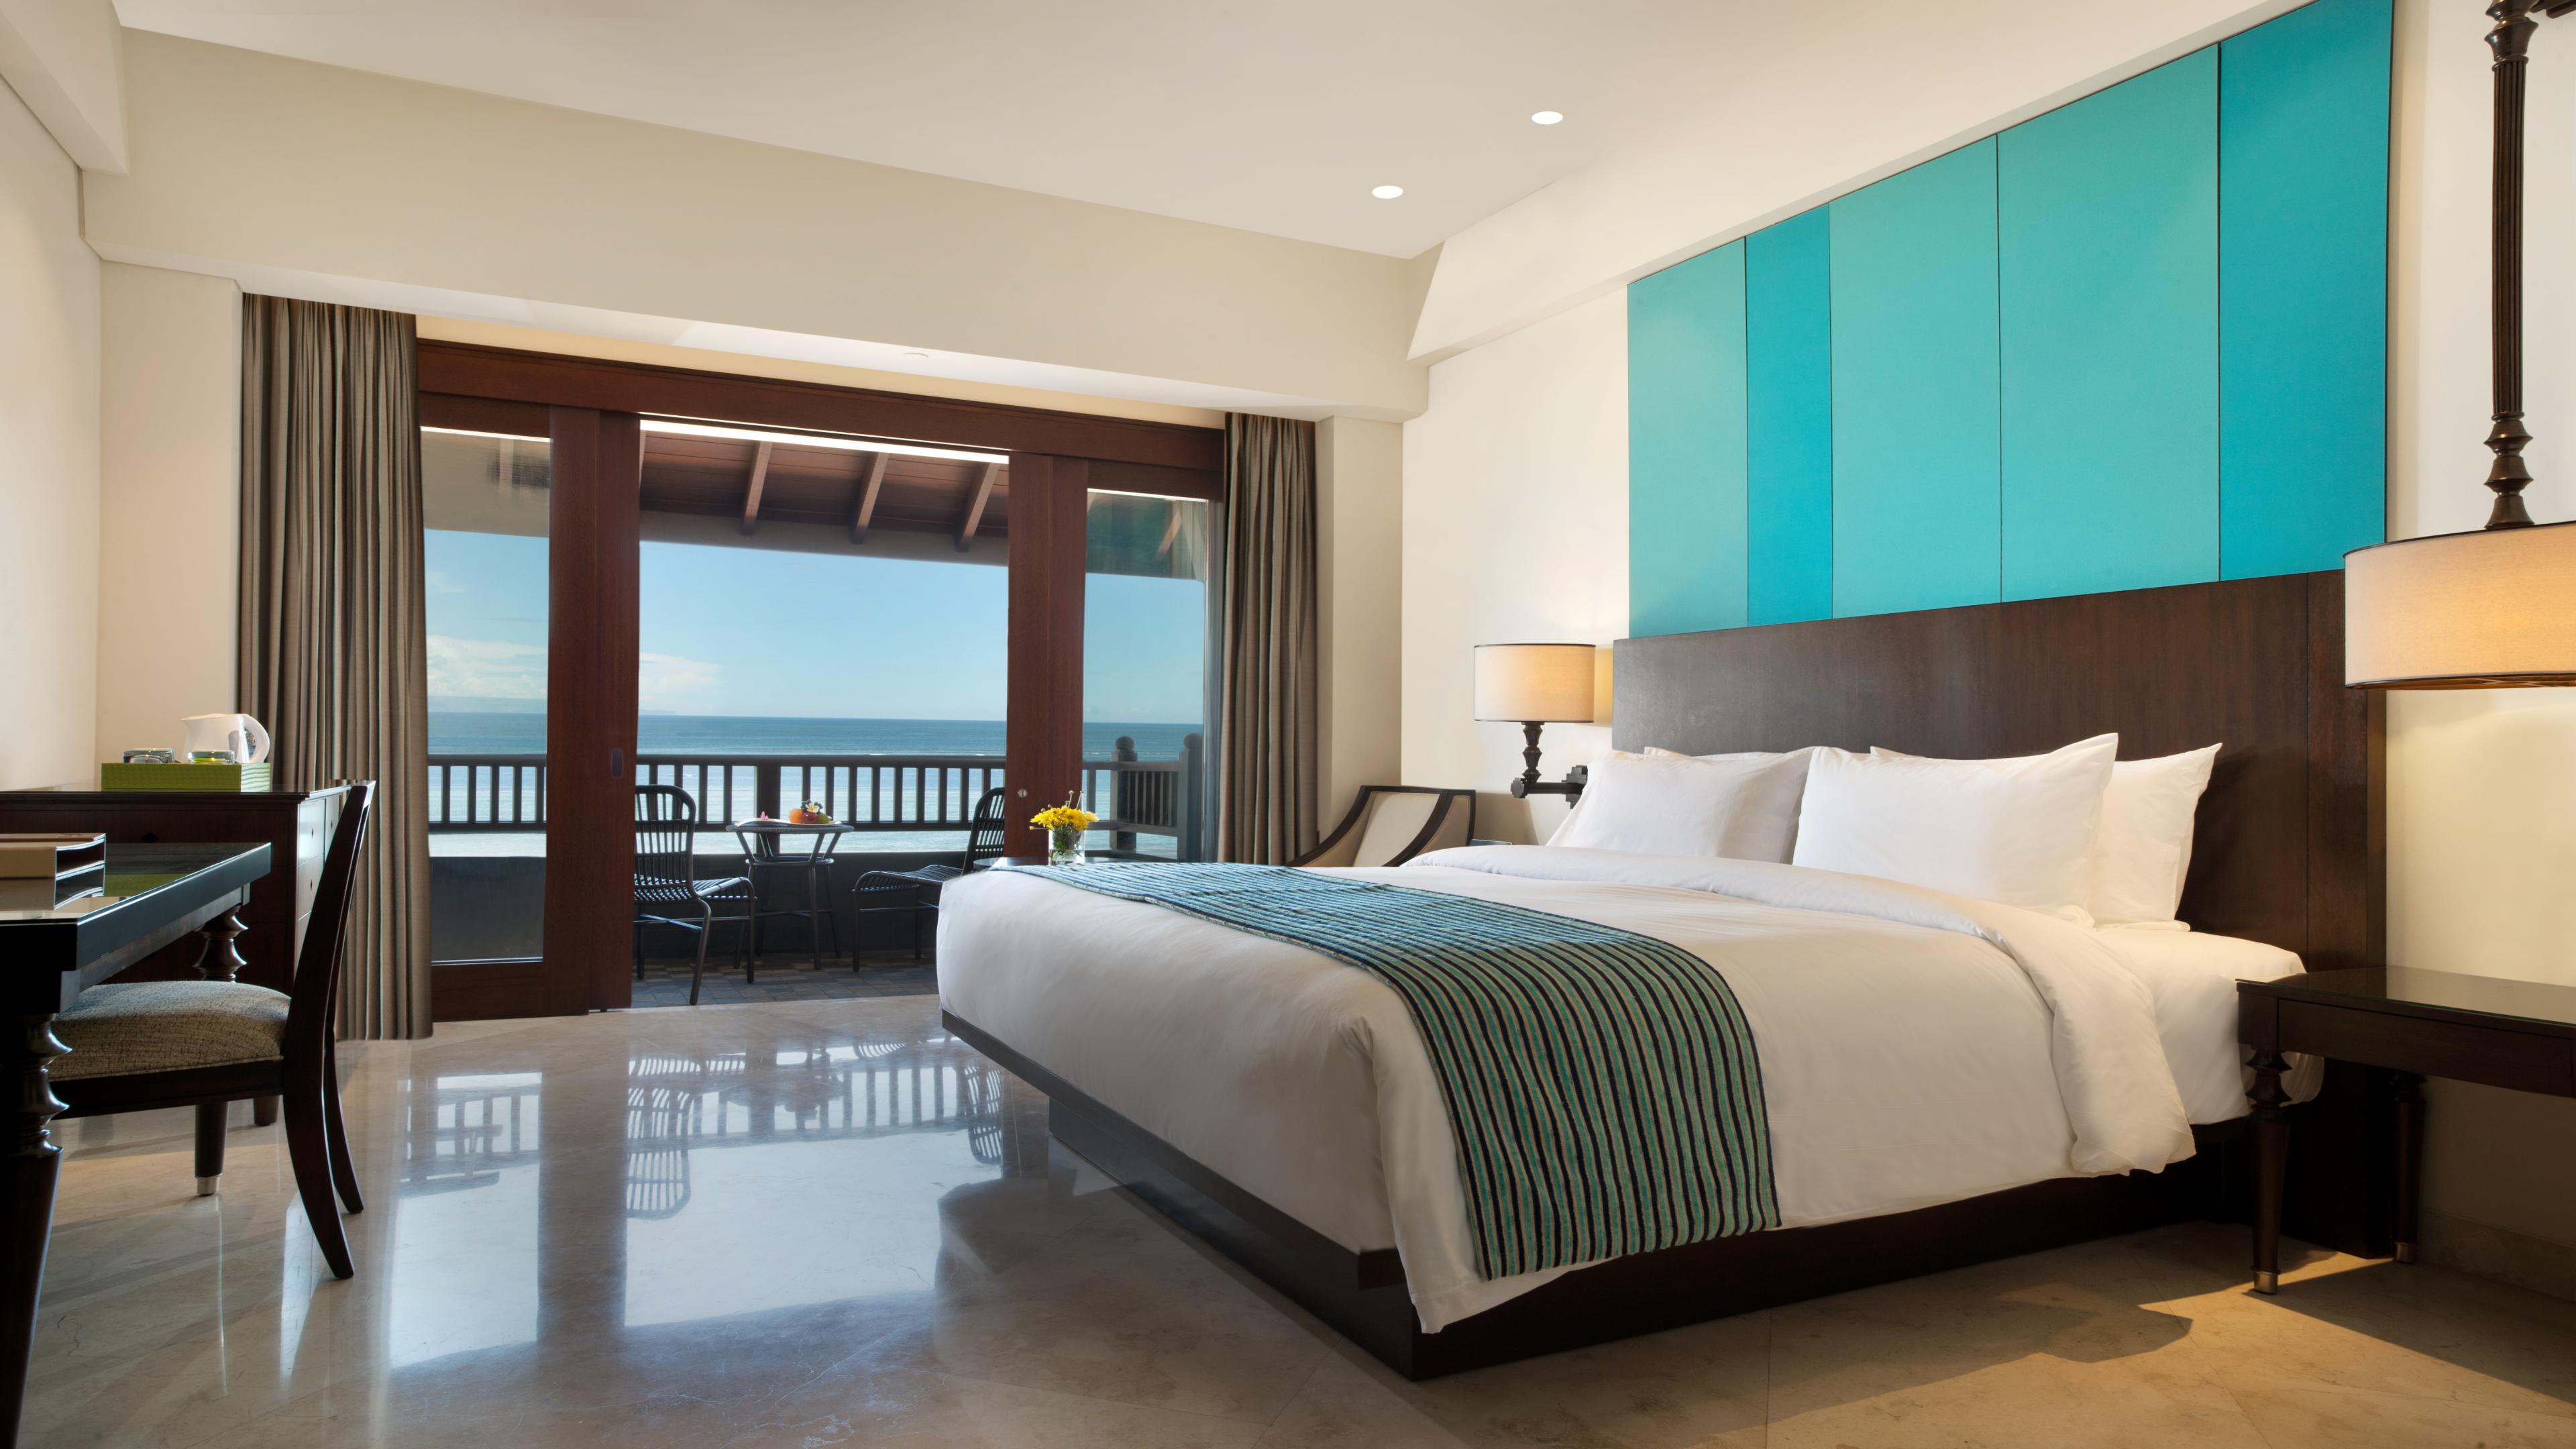 Ihg welcomed holiday inn resort bali benoa to its portfolio of hotels on the beautiful island of bali indonesia